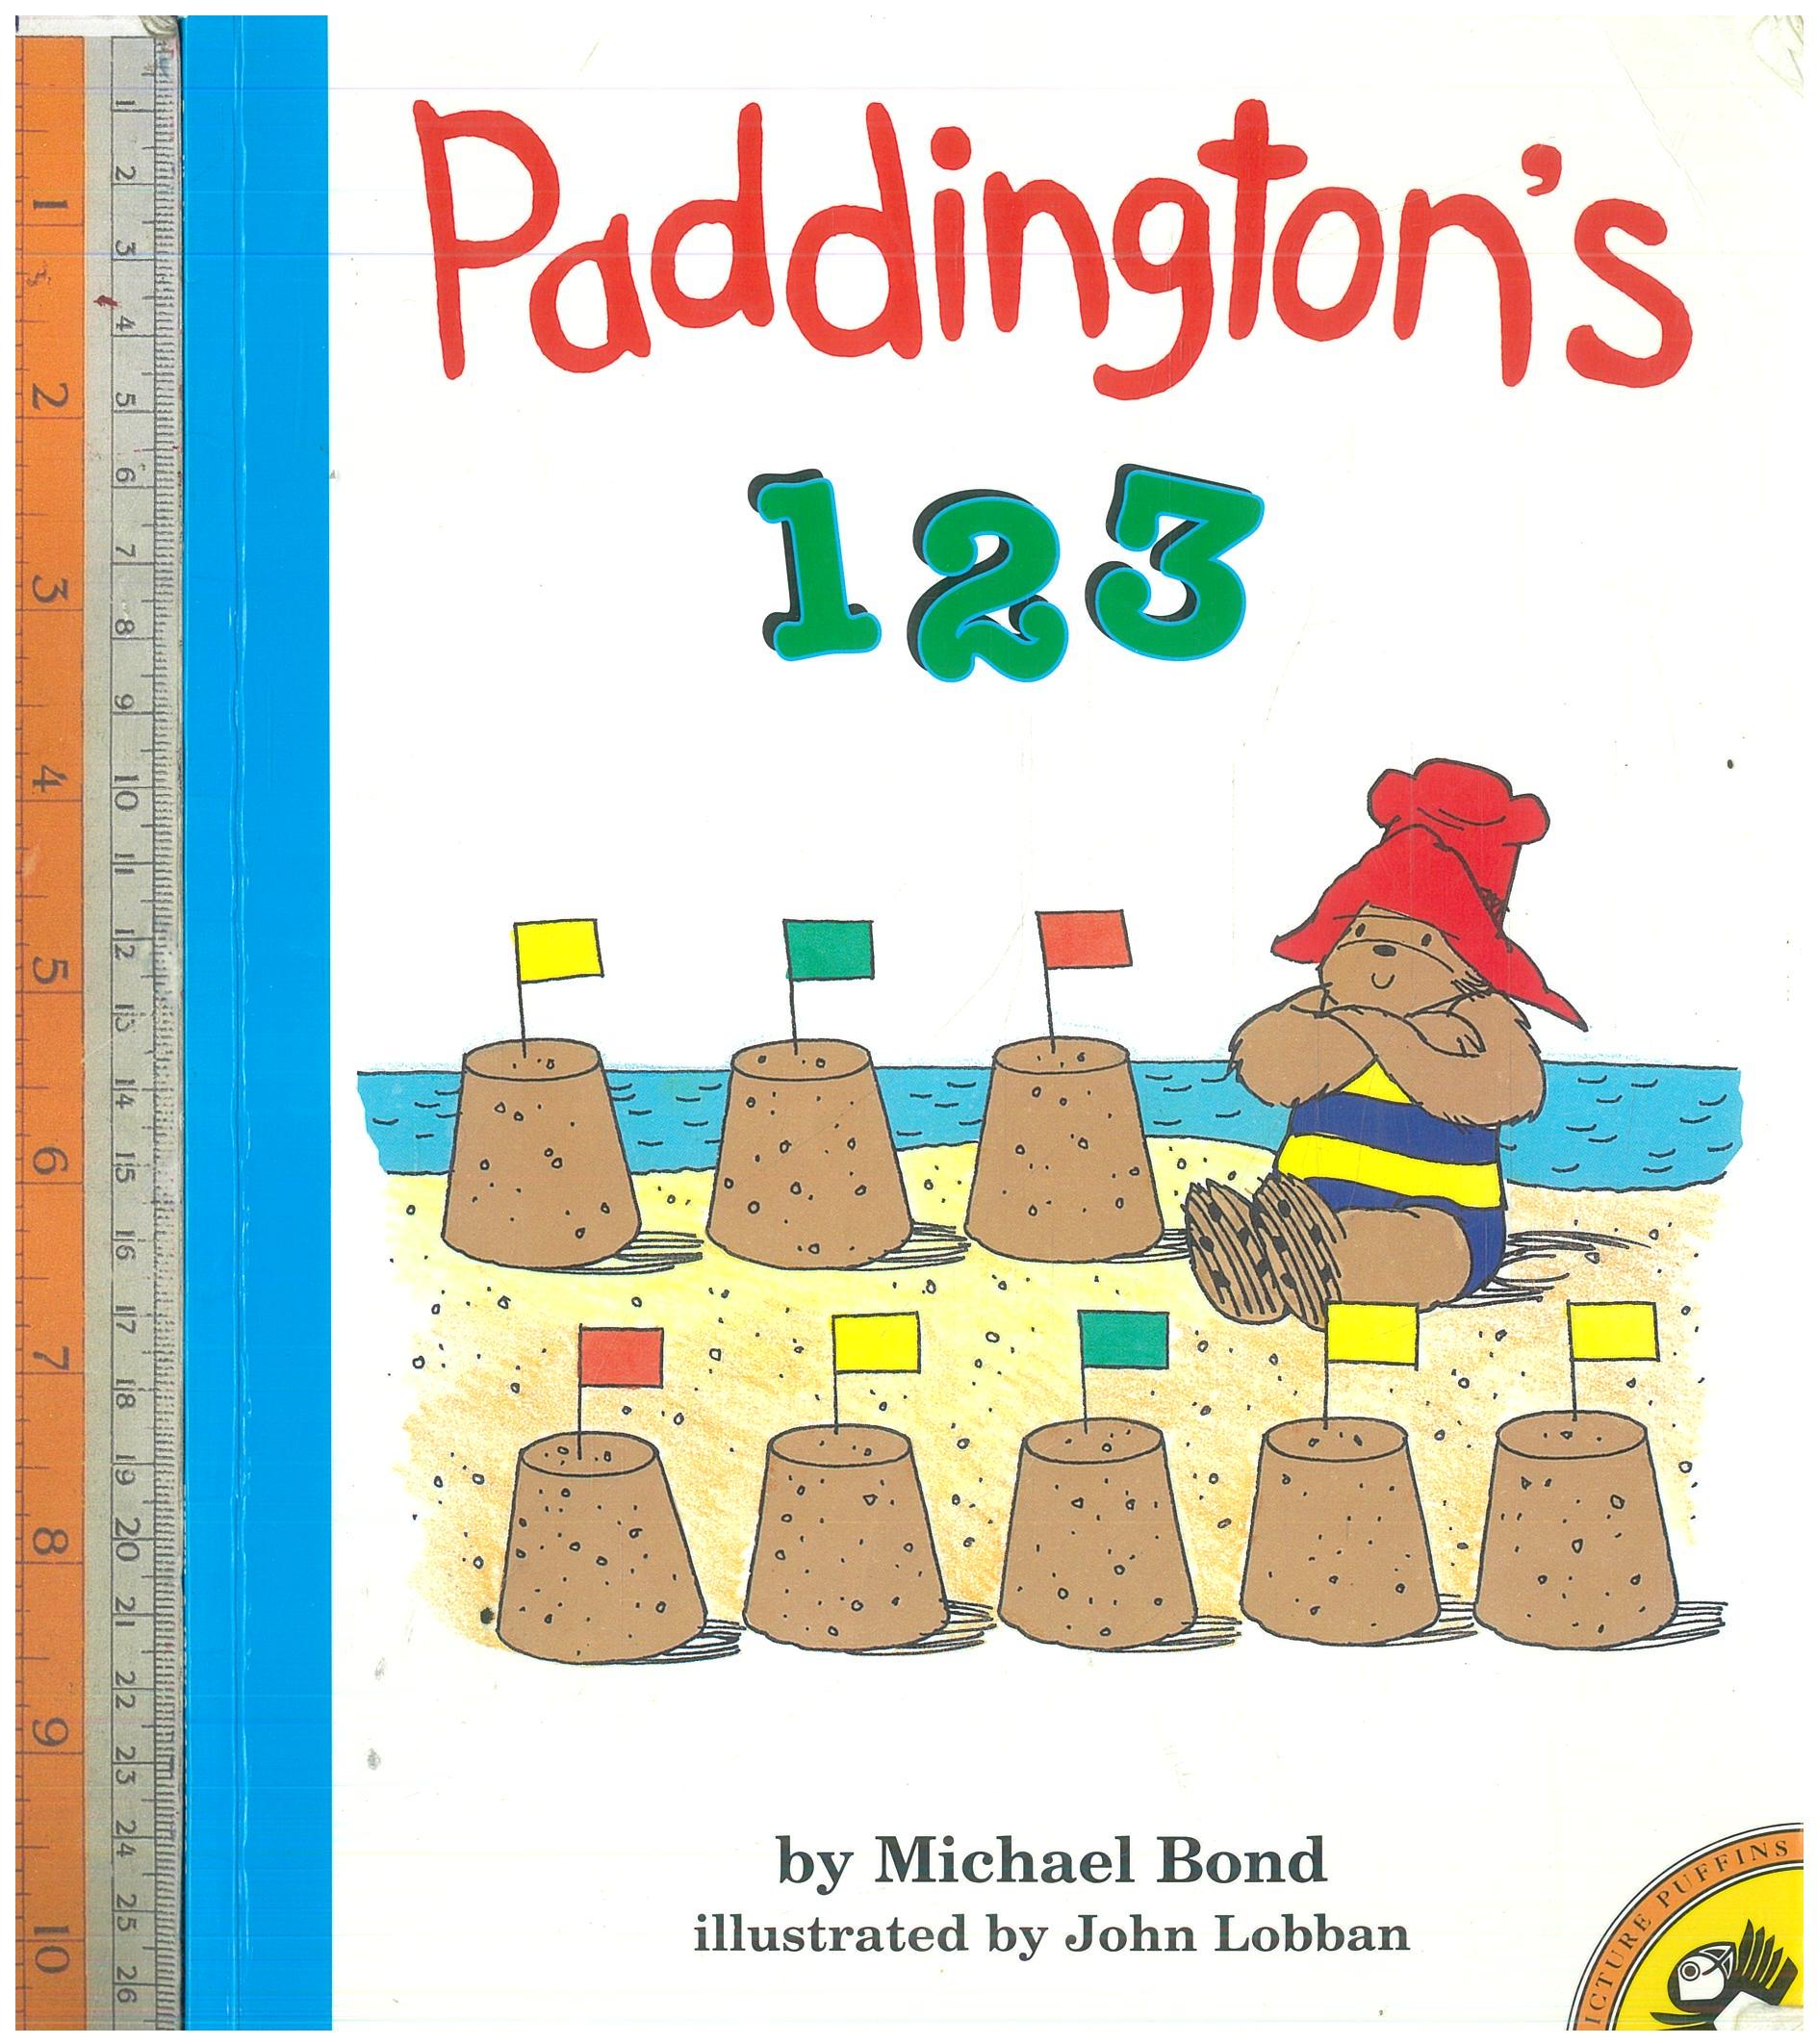 paddington123